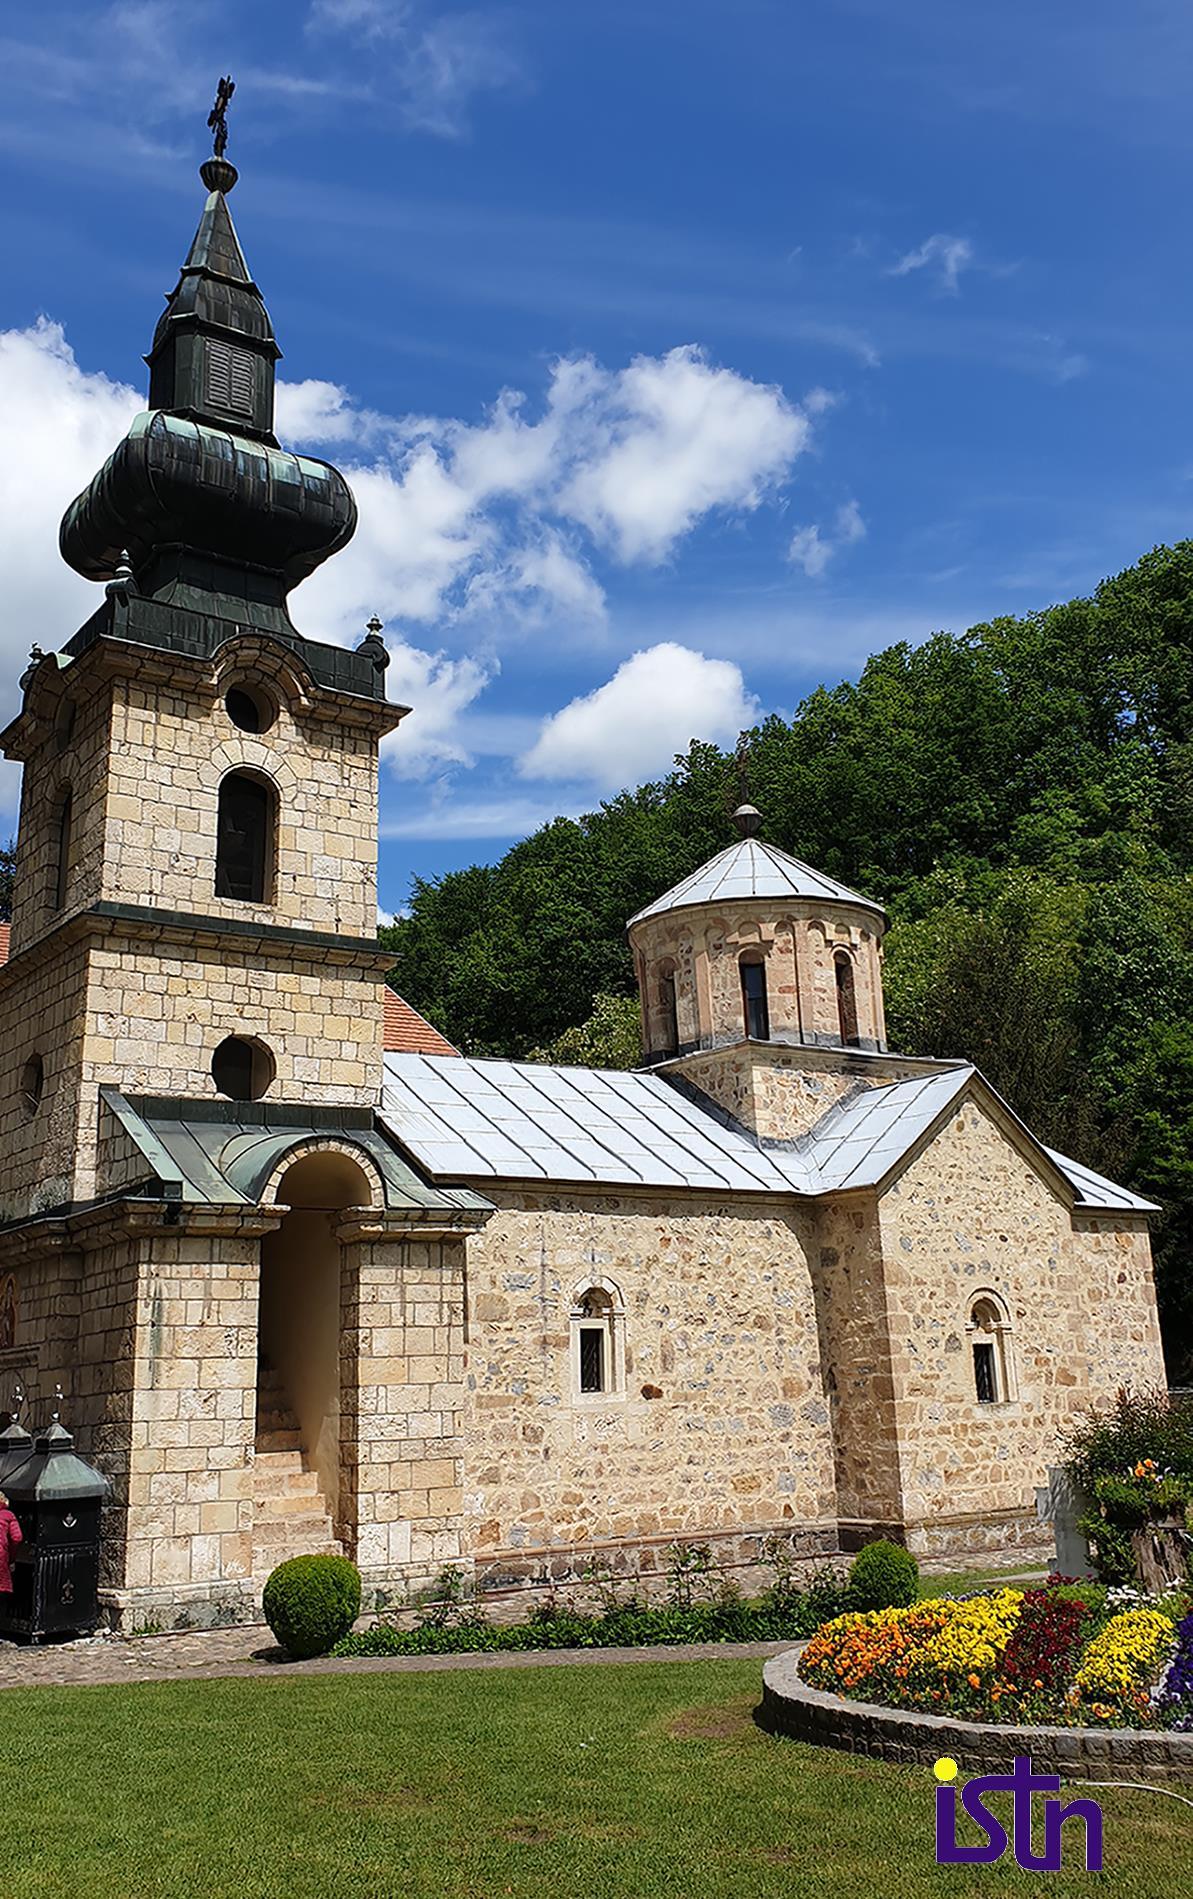 Manastir Tronosa, trsic, ISTN